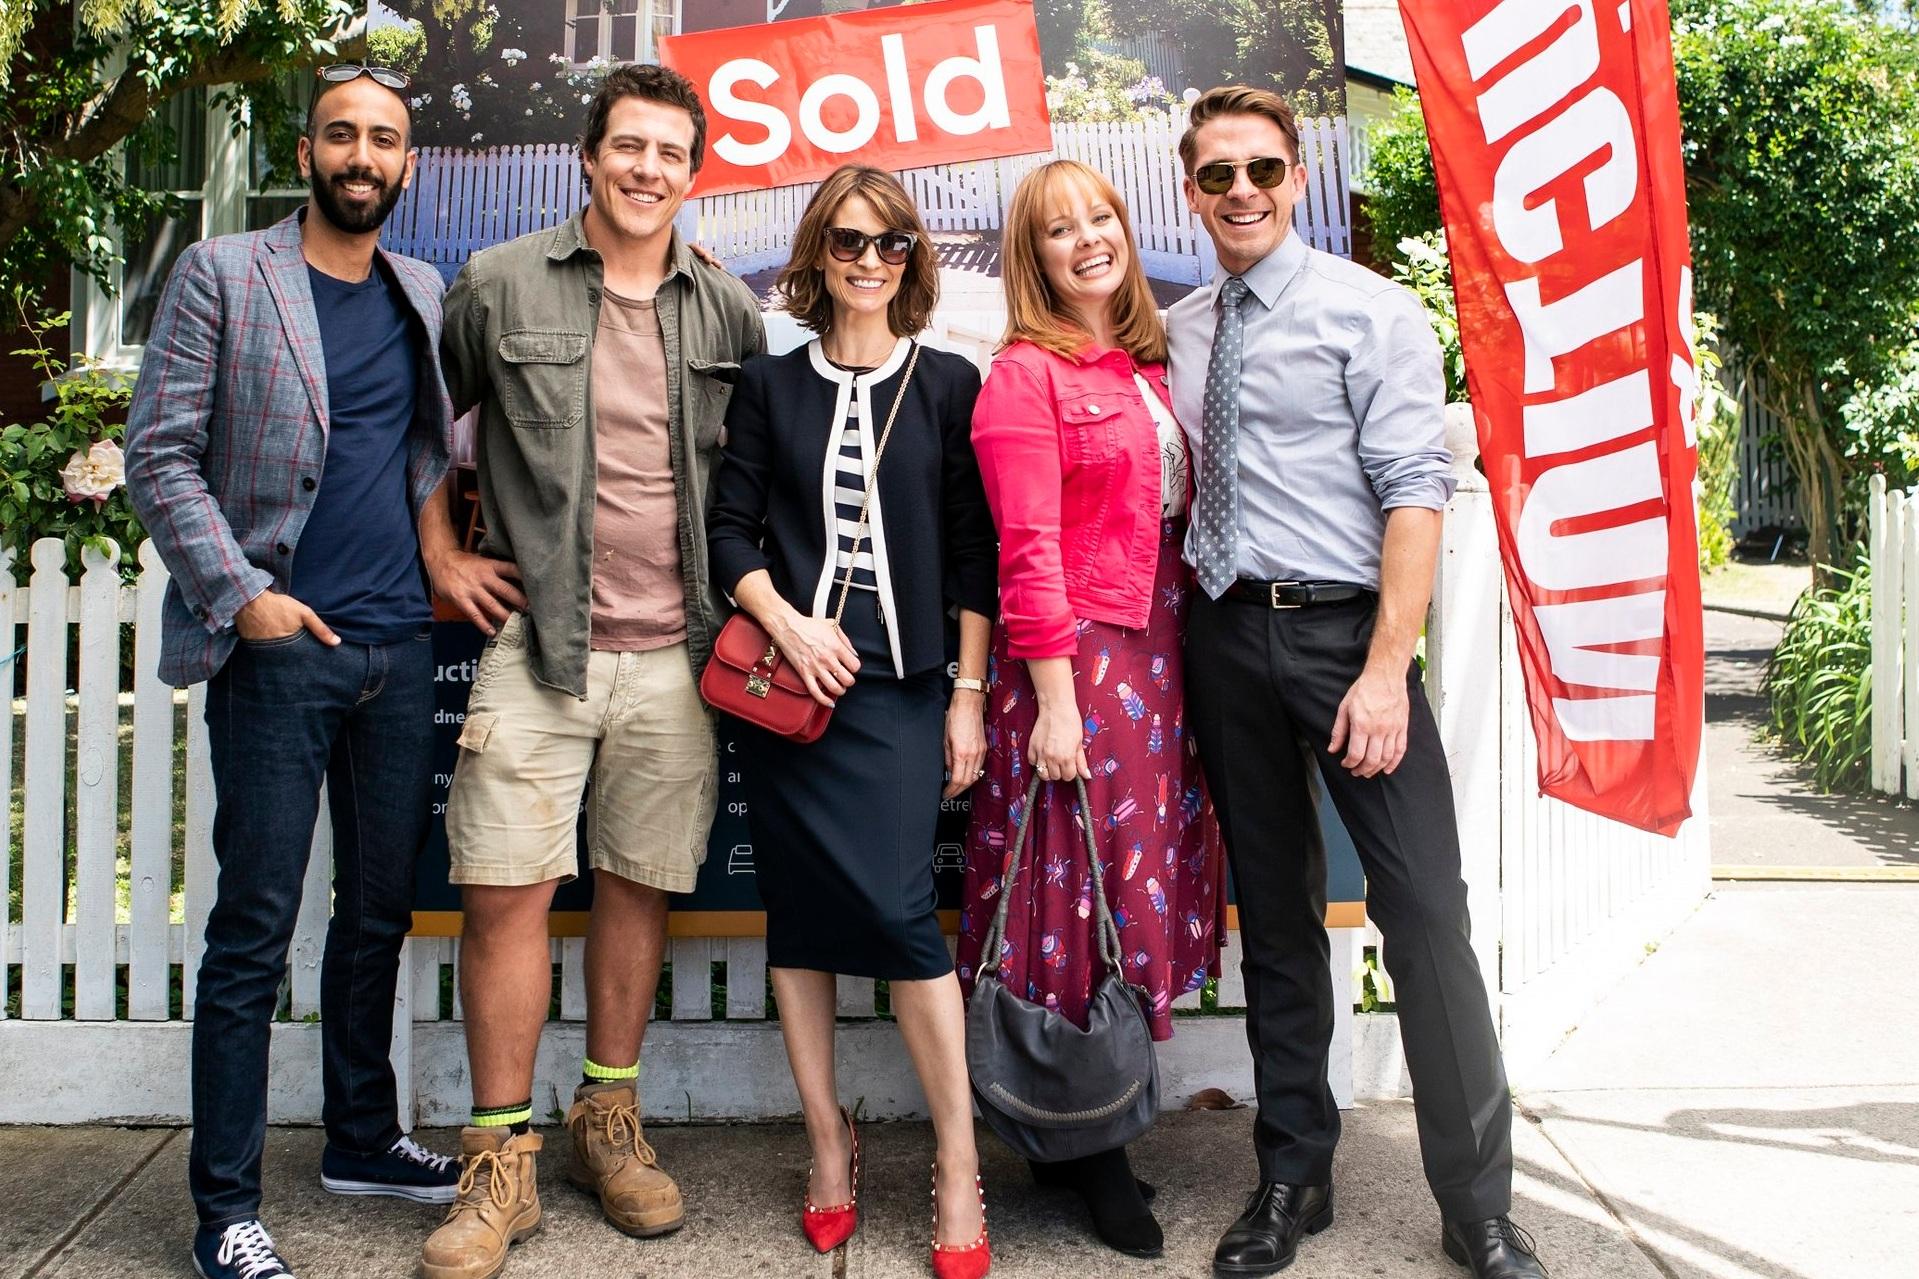 Harry (Roy Joseph), Ben (Stephen Peacocke), Liz (Kat Stewart), Ainsley (Katie Robertson), Lachlan (Hugh Sheridan)  image - 10